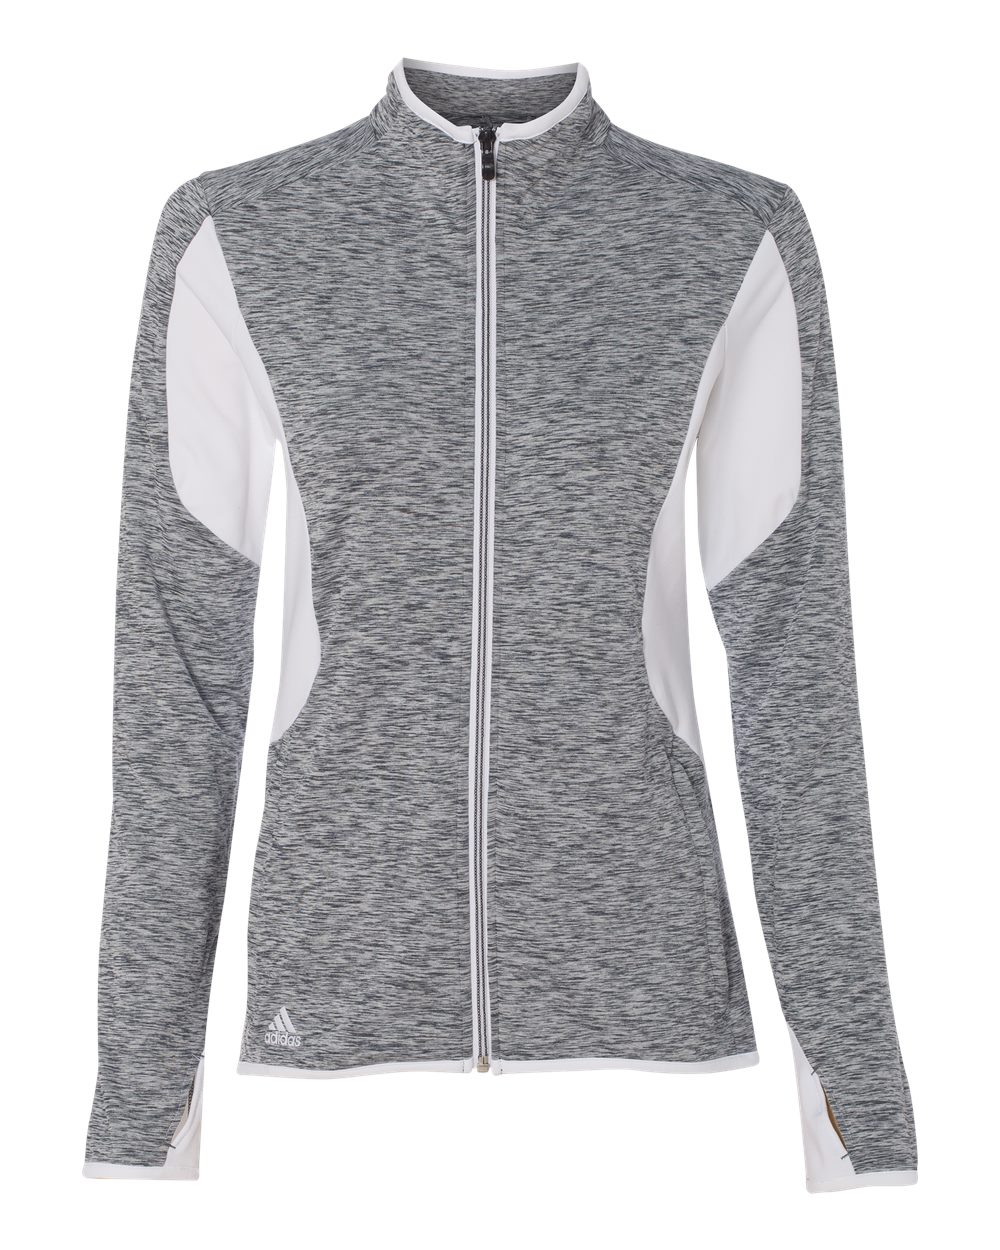 Adidas Golf Women s Space Dyed Full-Zip Jacket 7ba4fef83f